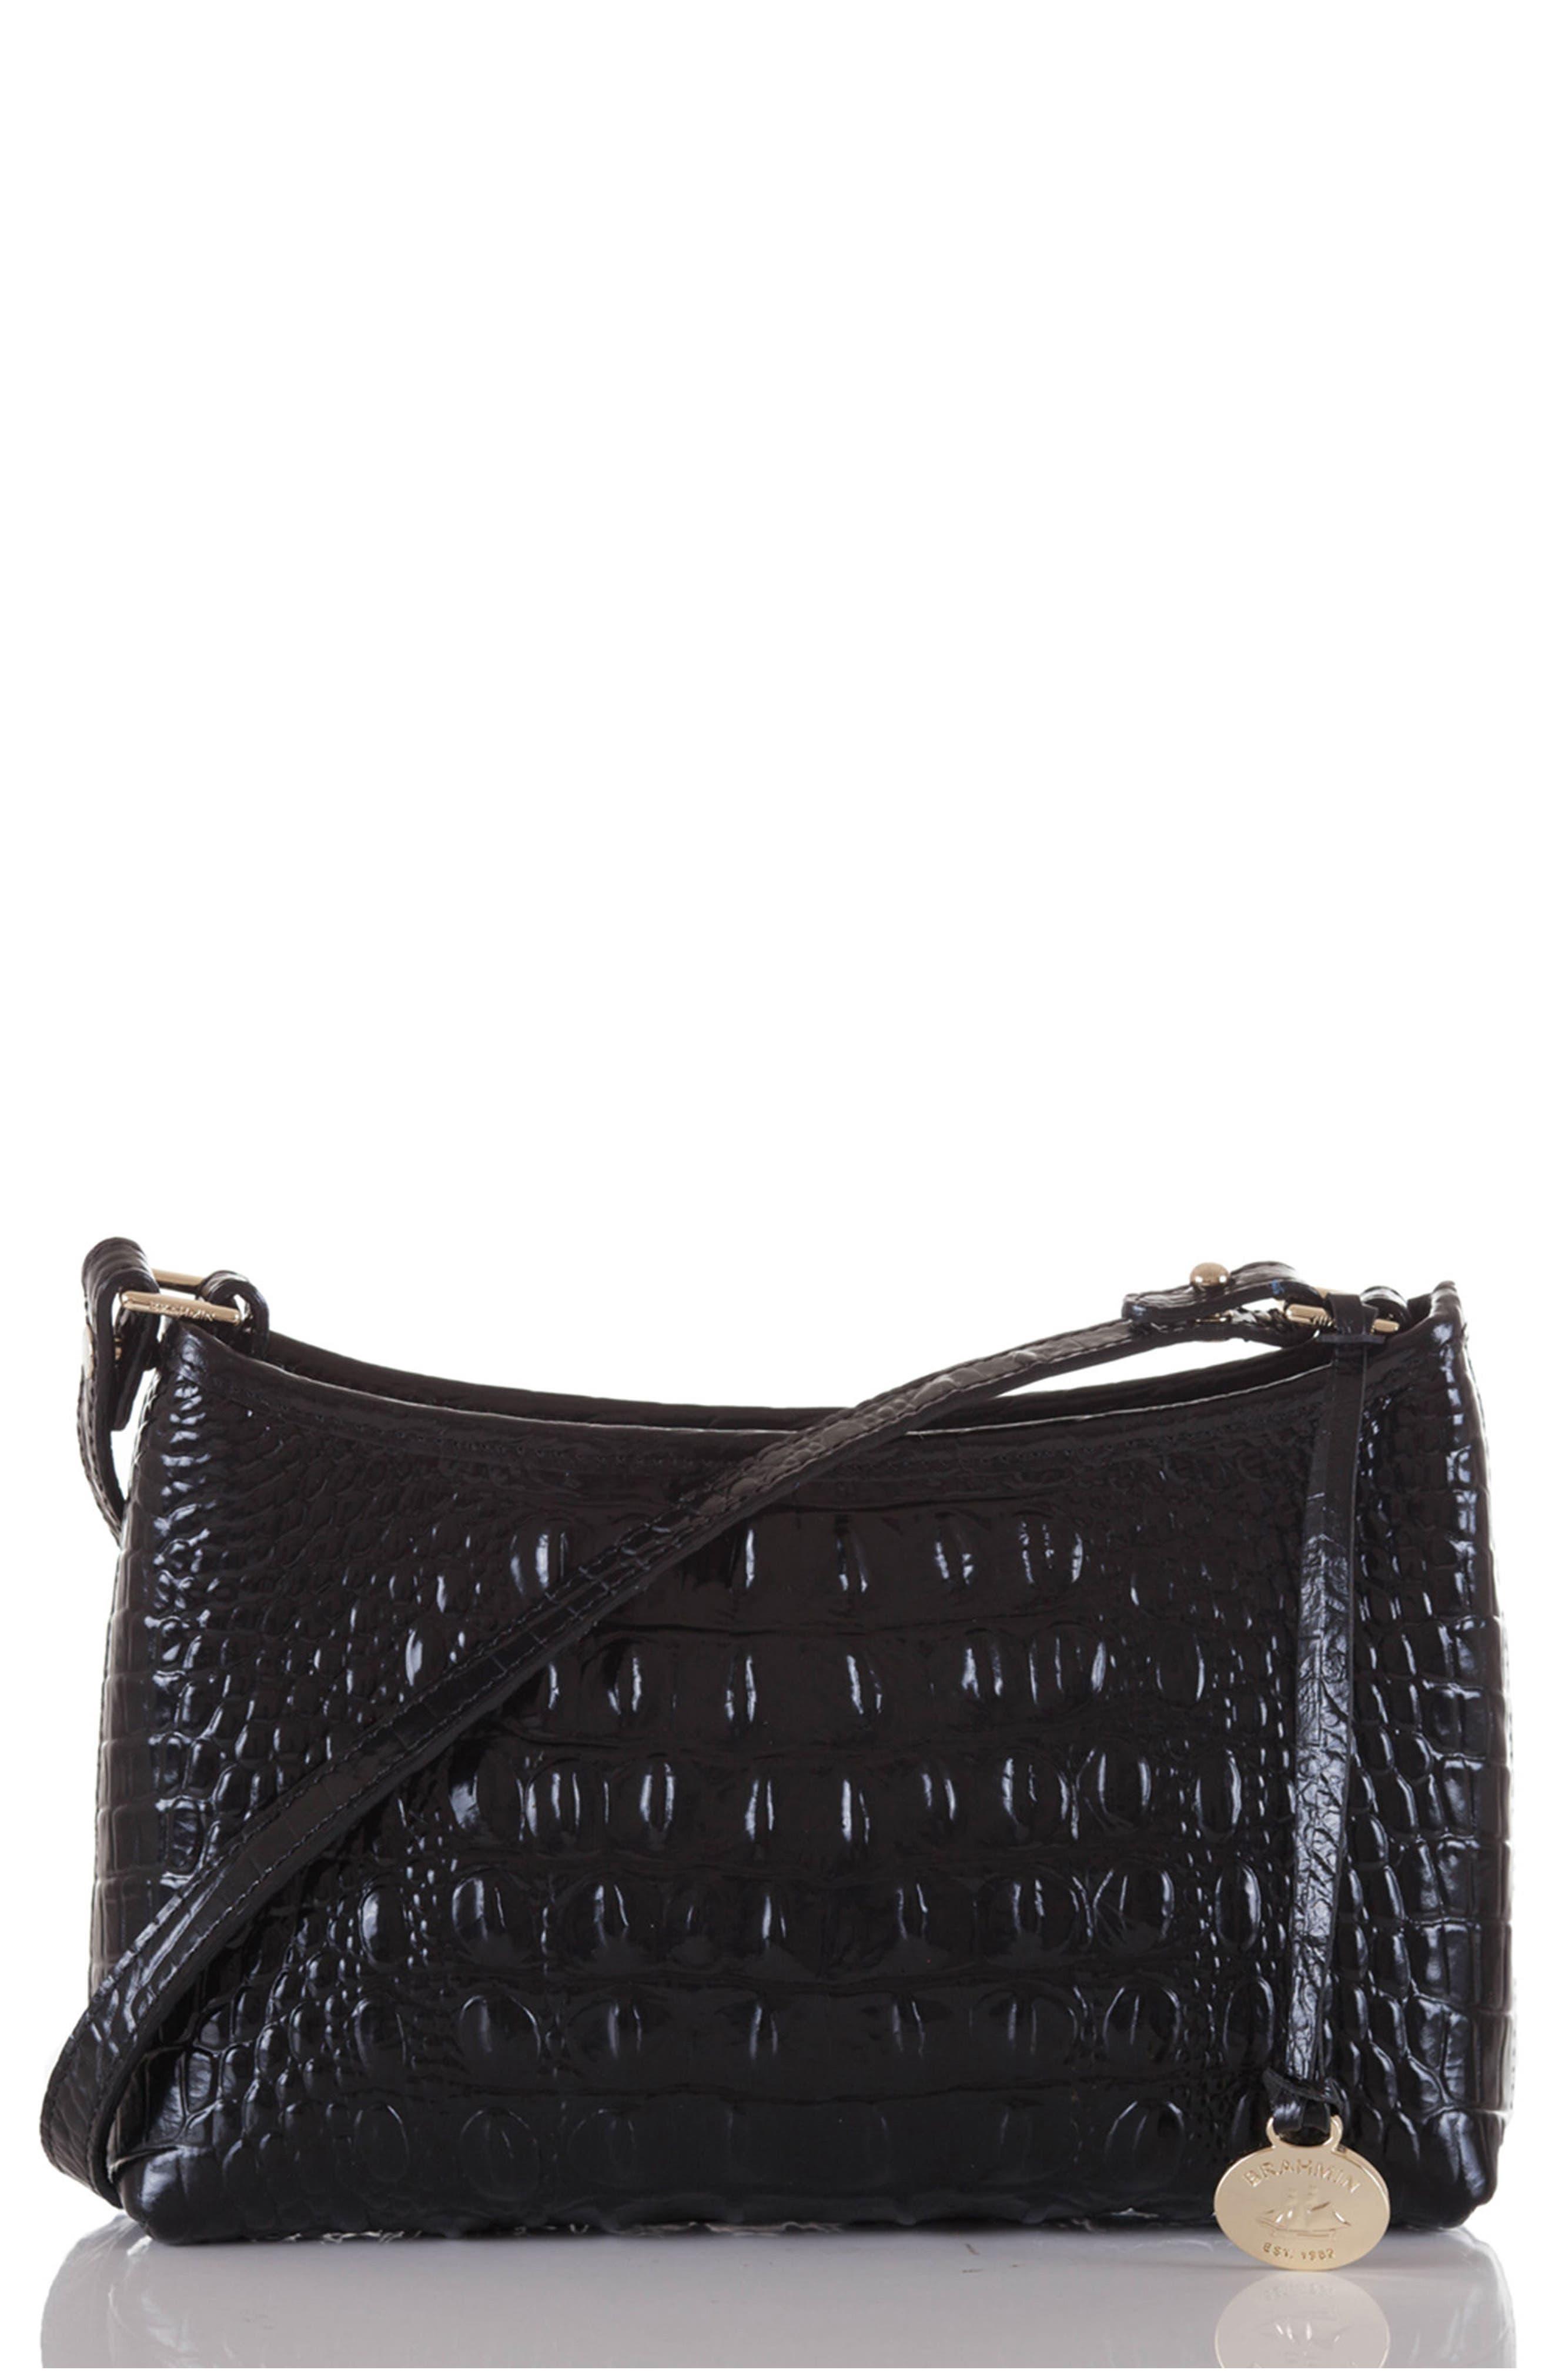 'Anytime - Mini' Convertible Handbag,                             Alternate thumbnail 24, color,